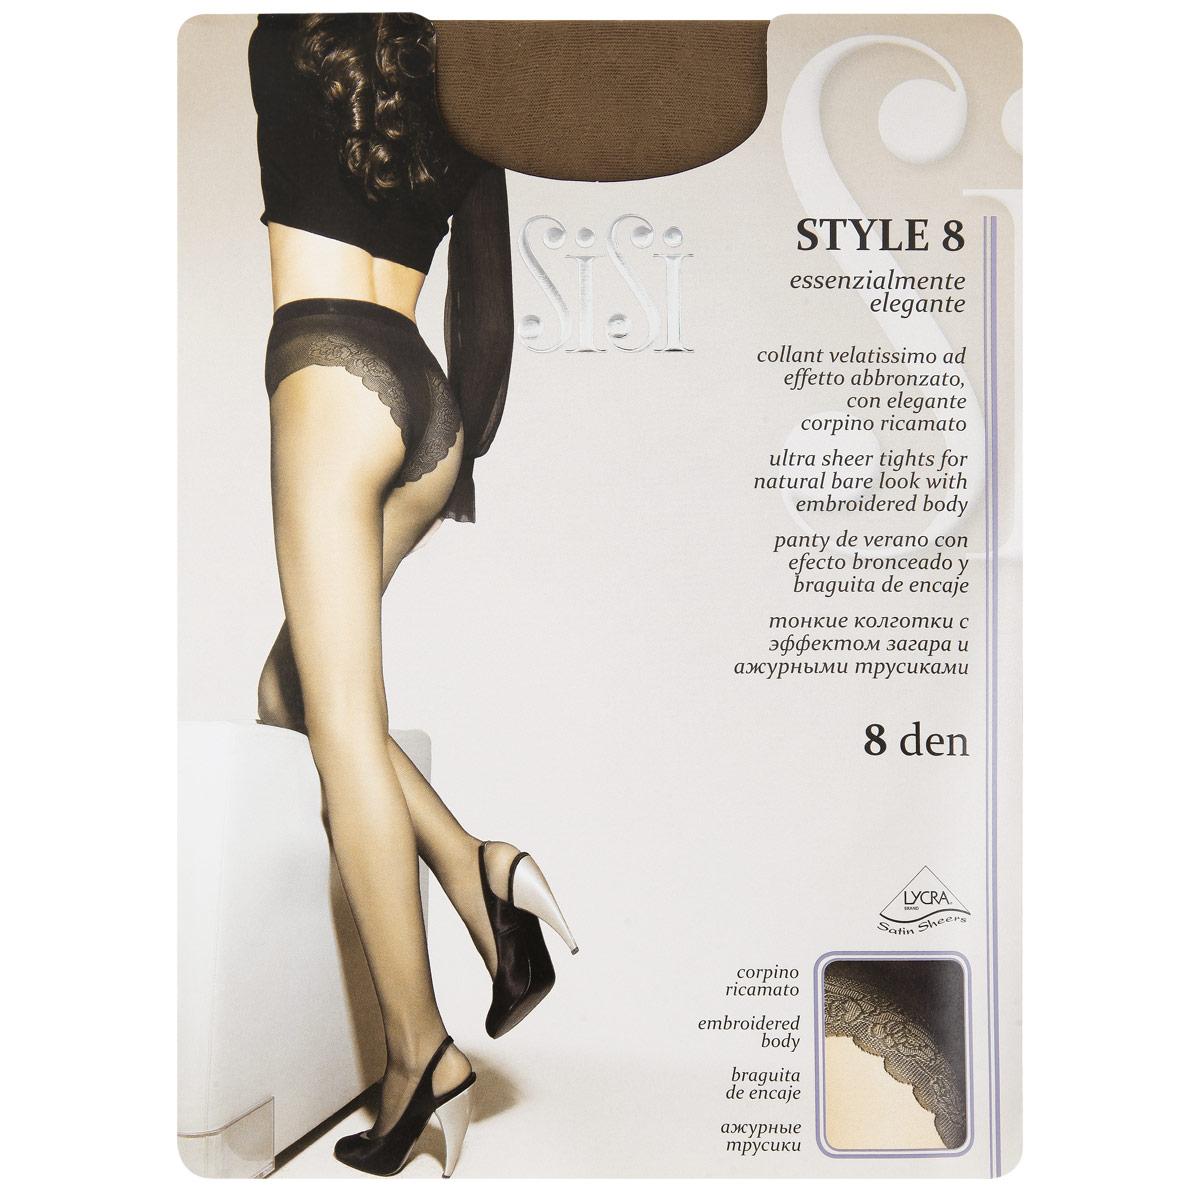 Колготки женские Sisi Style 8, цвет: Tropico (темно-коричневый). 142. Размер 3 (M) колготки sisi style размер 2 плотность 15 den nero